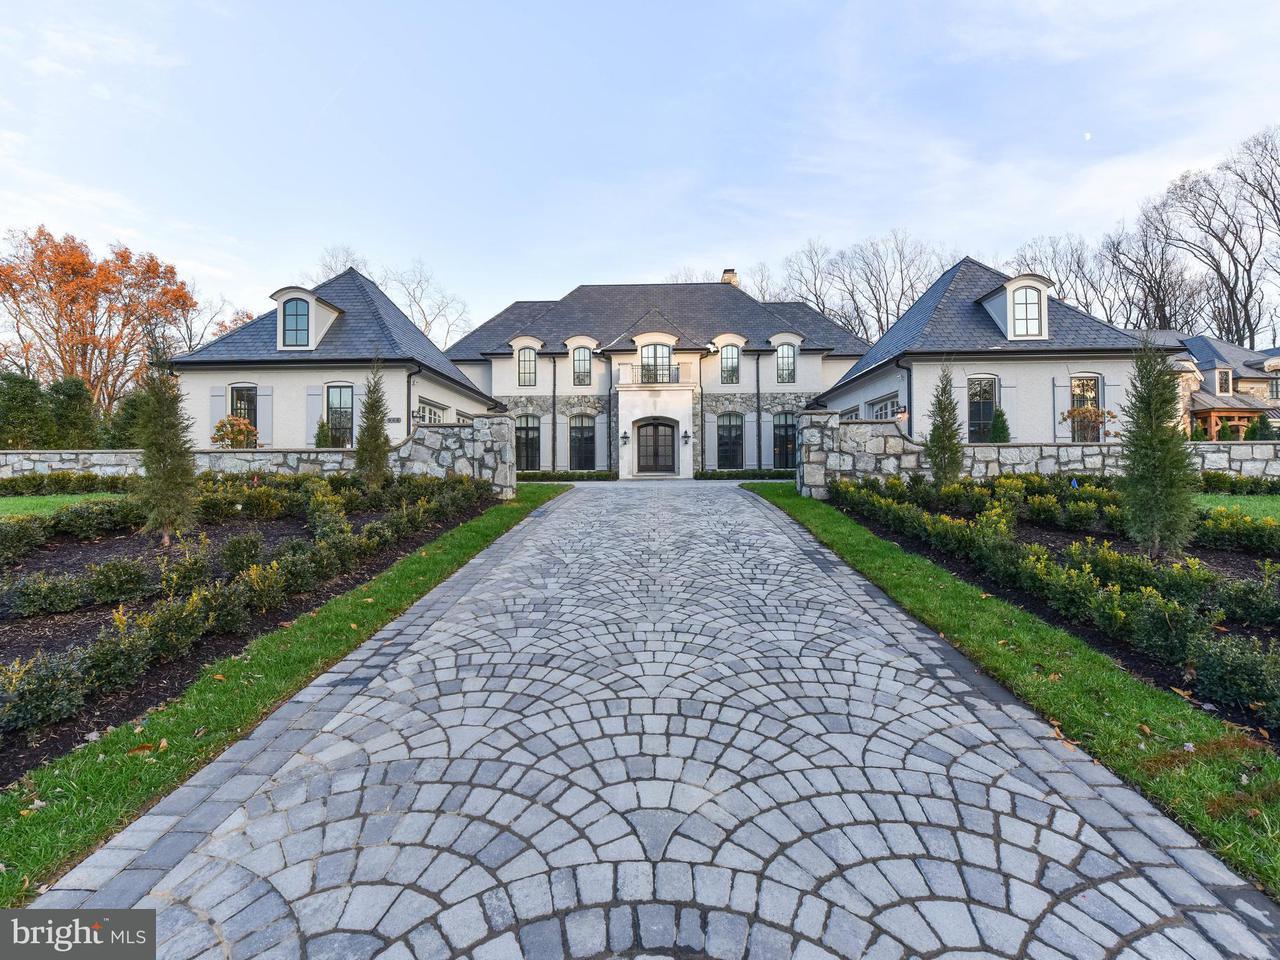 Single Family Home for Sale at 948 MACKALL FARMS Lane 948 MACKALL FARMS Lane McLean, Virginia 22101 United States